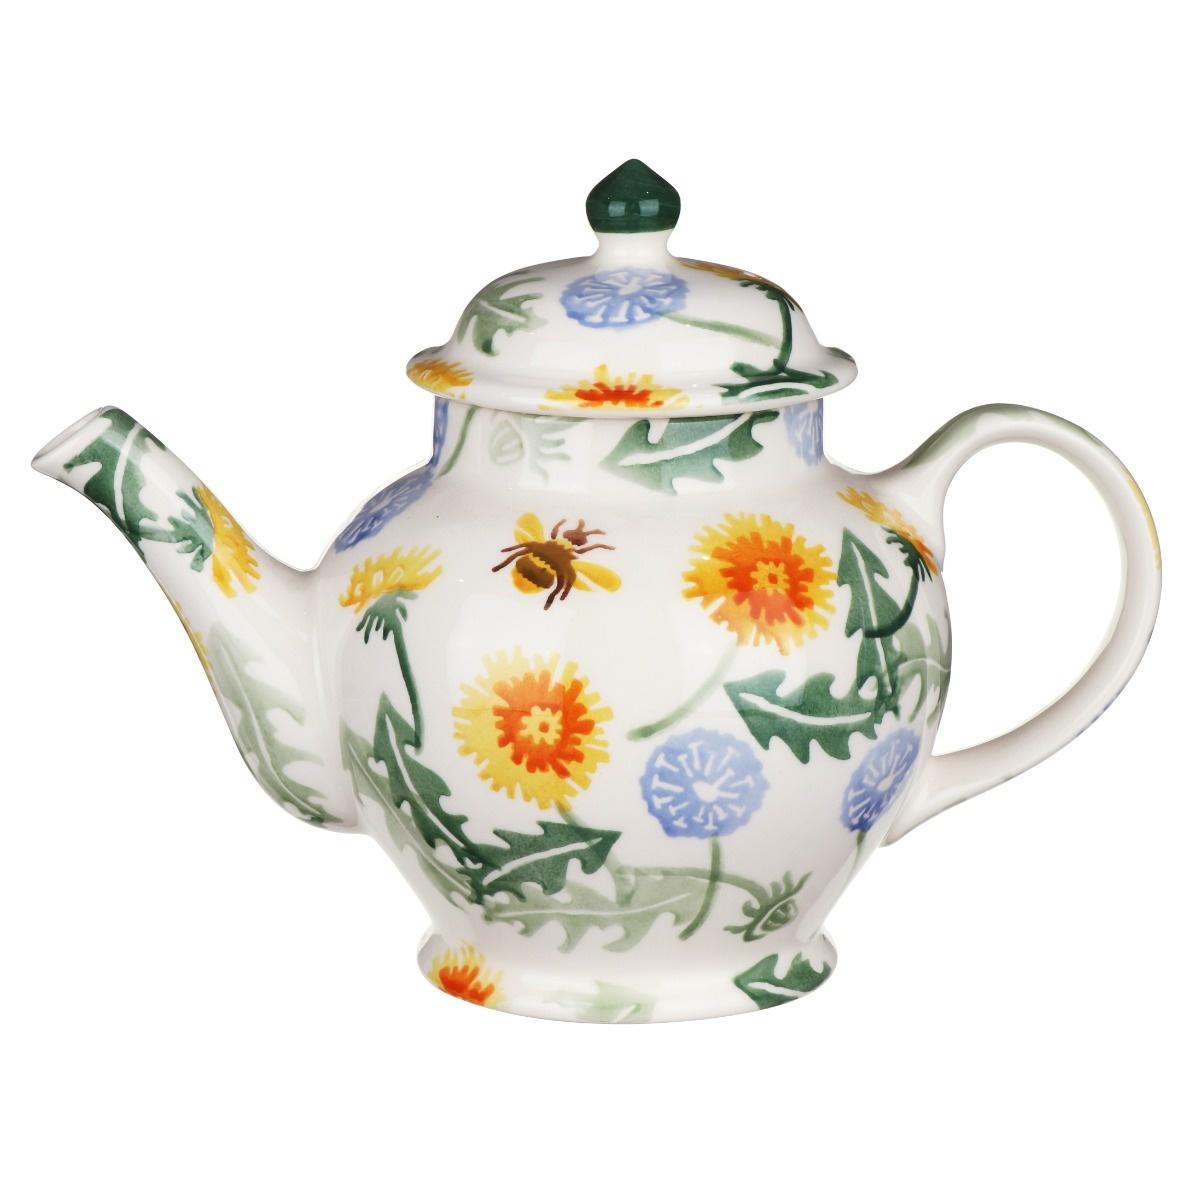 Teapot - Dandelion - 3 Mug-1